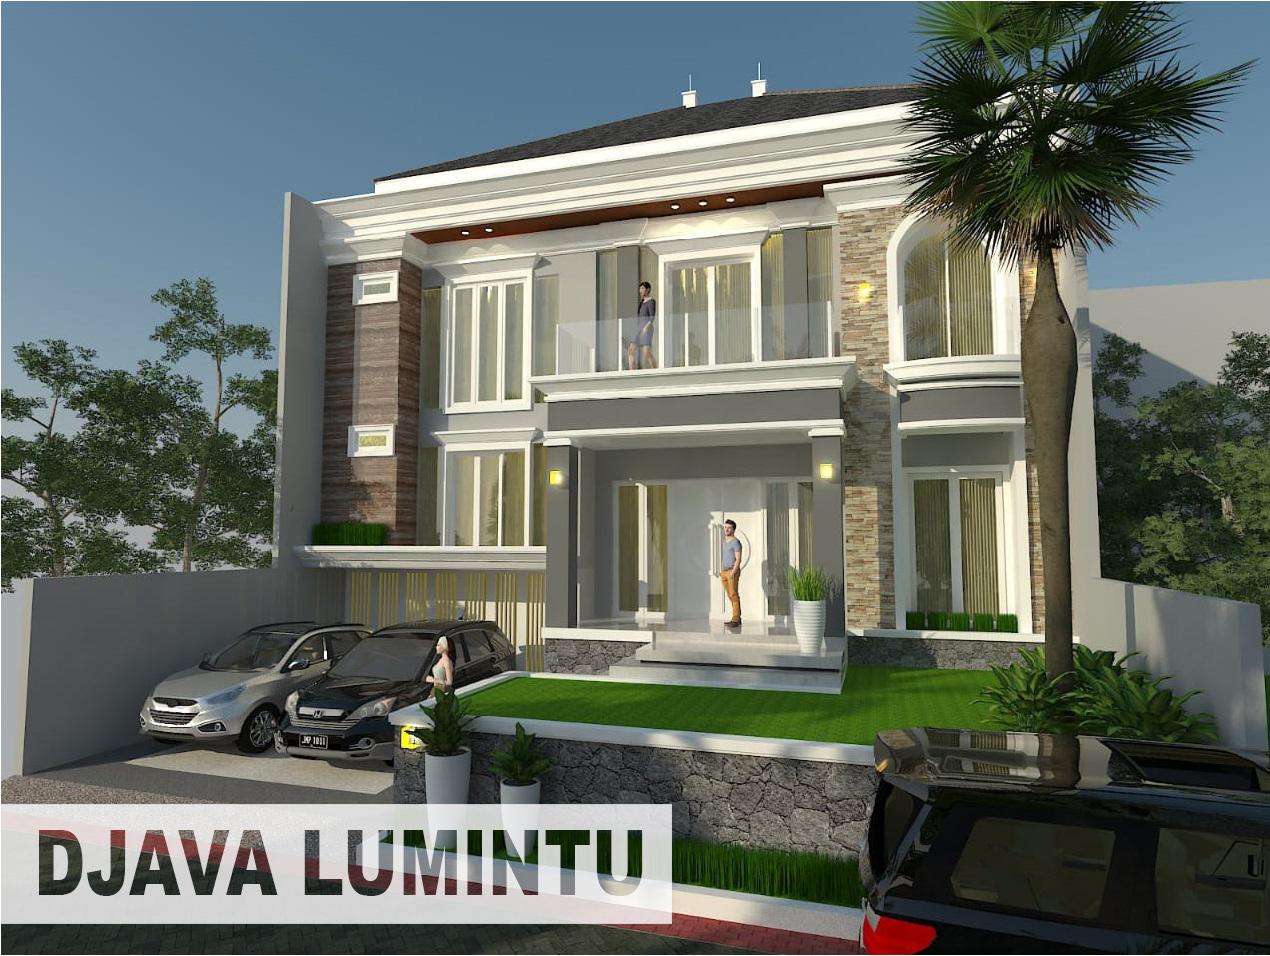 Jasa Arsitek Rumah Tropis Arsitek Bangunan Tropis Arsitek Rumah Minimalis Tropis Profesional Februari 2019